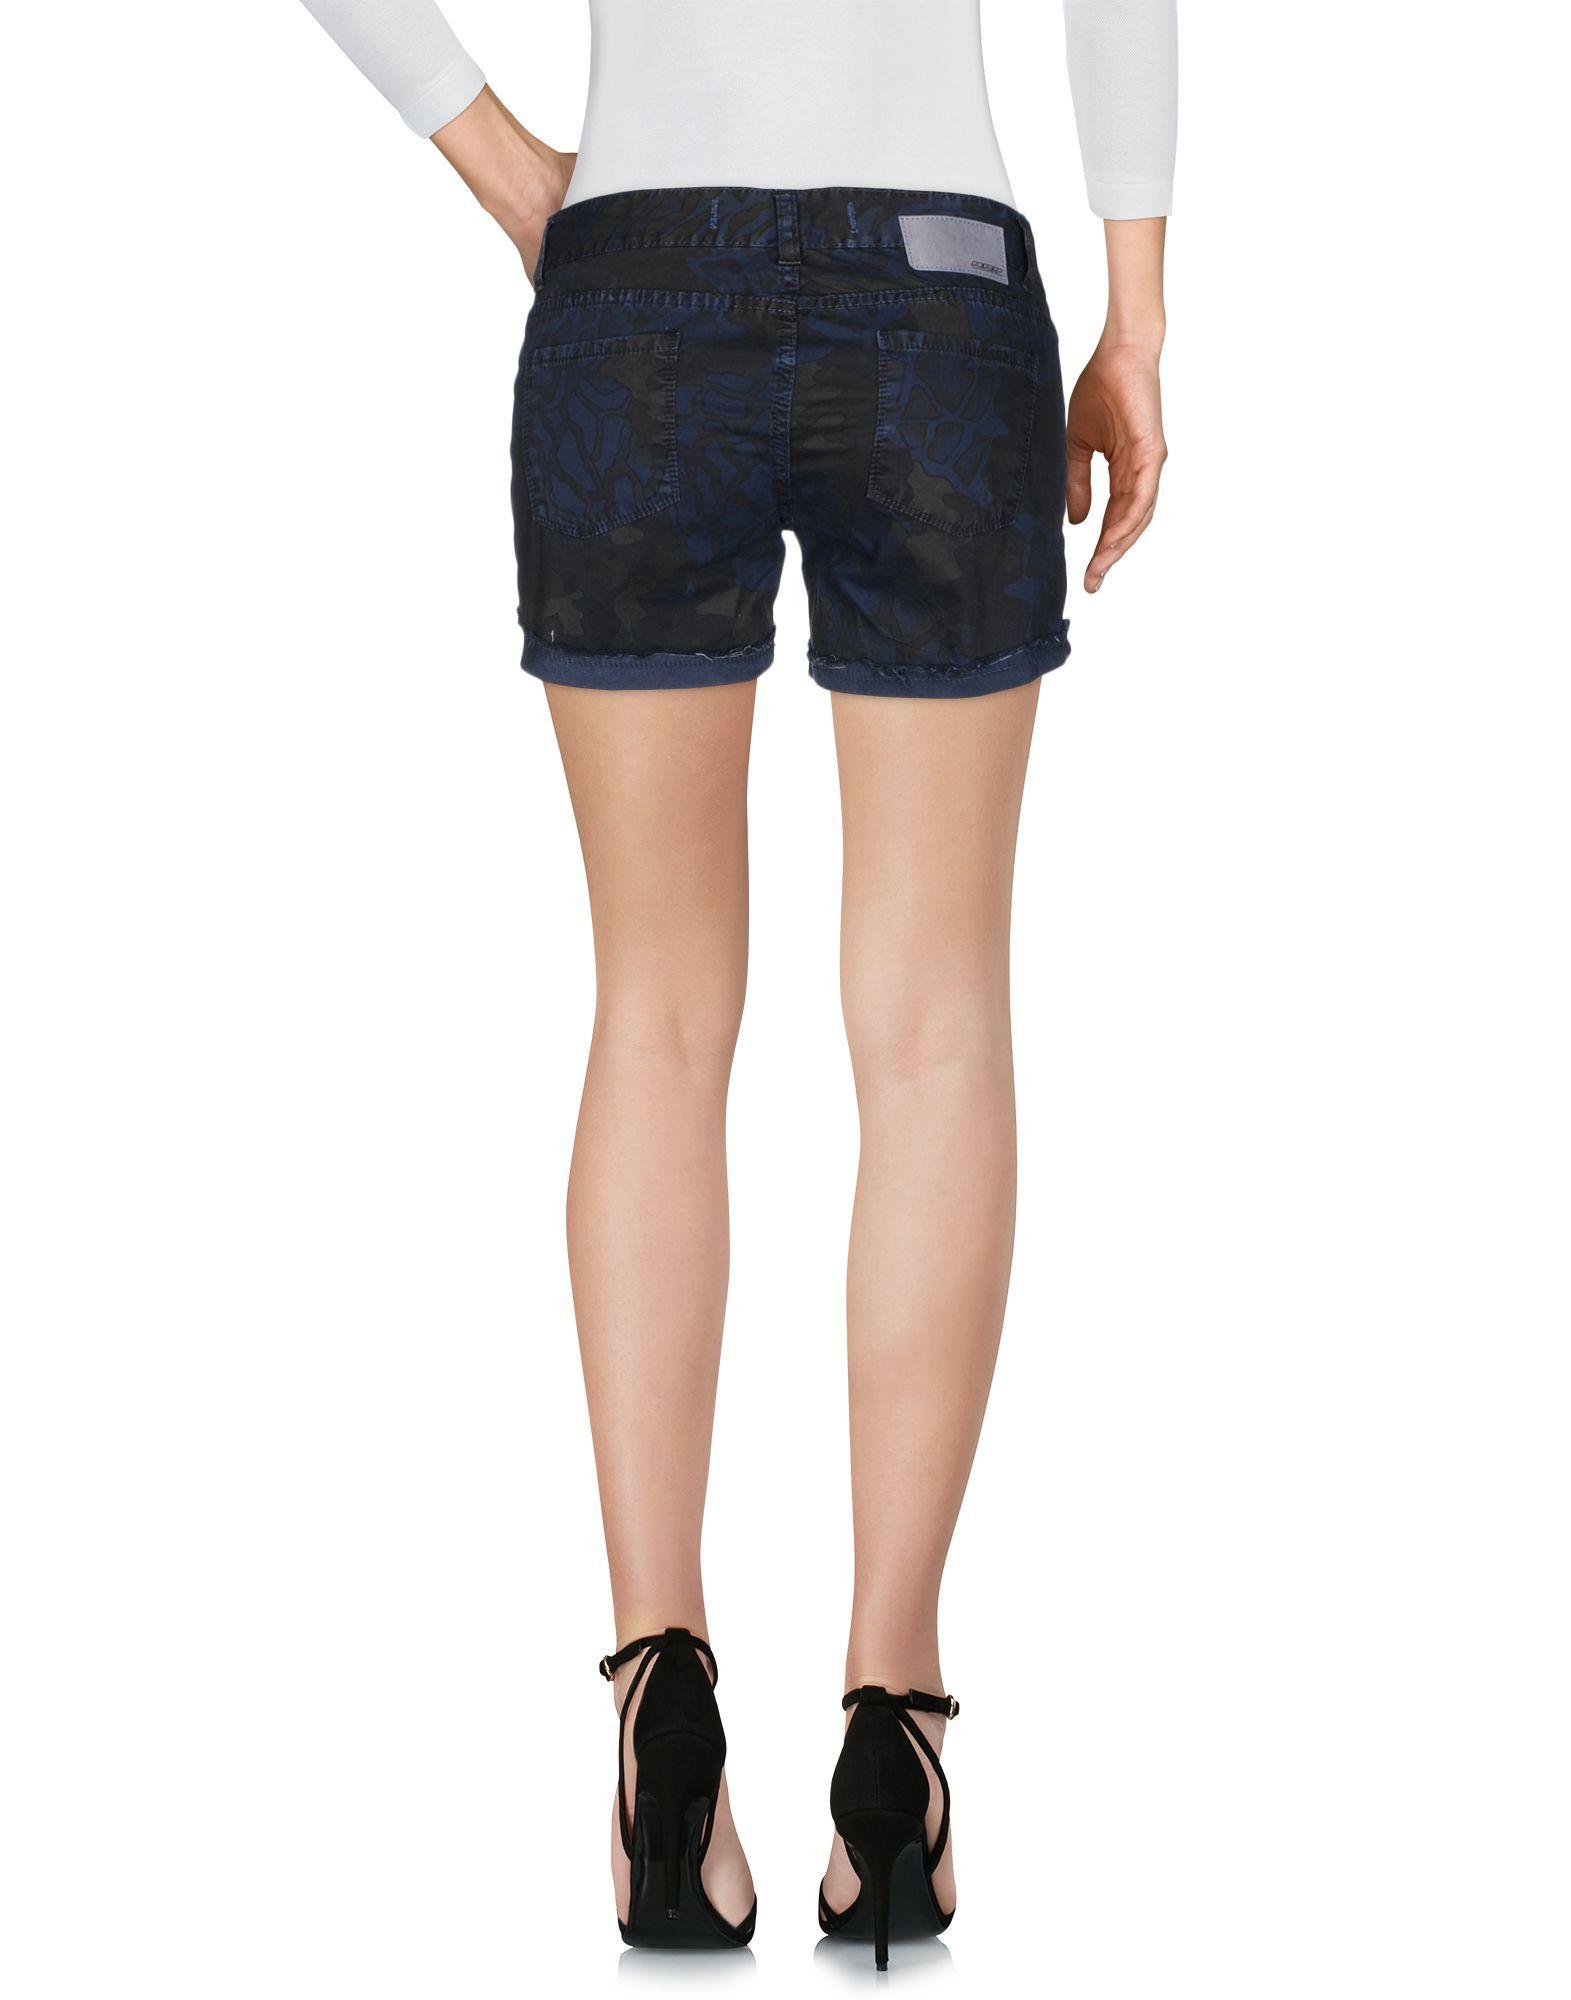 Rrd Dark Blue Cotton Shorts